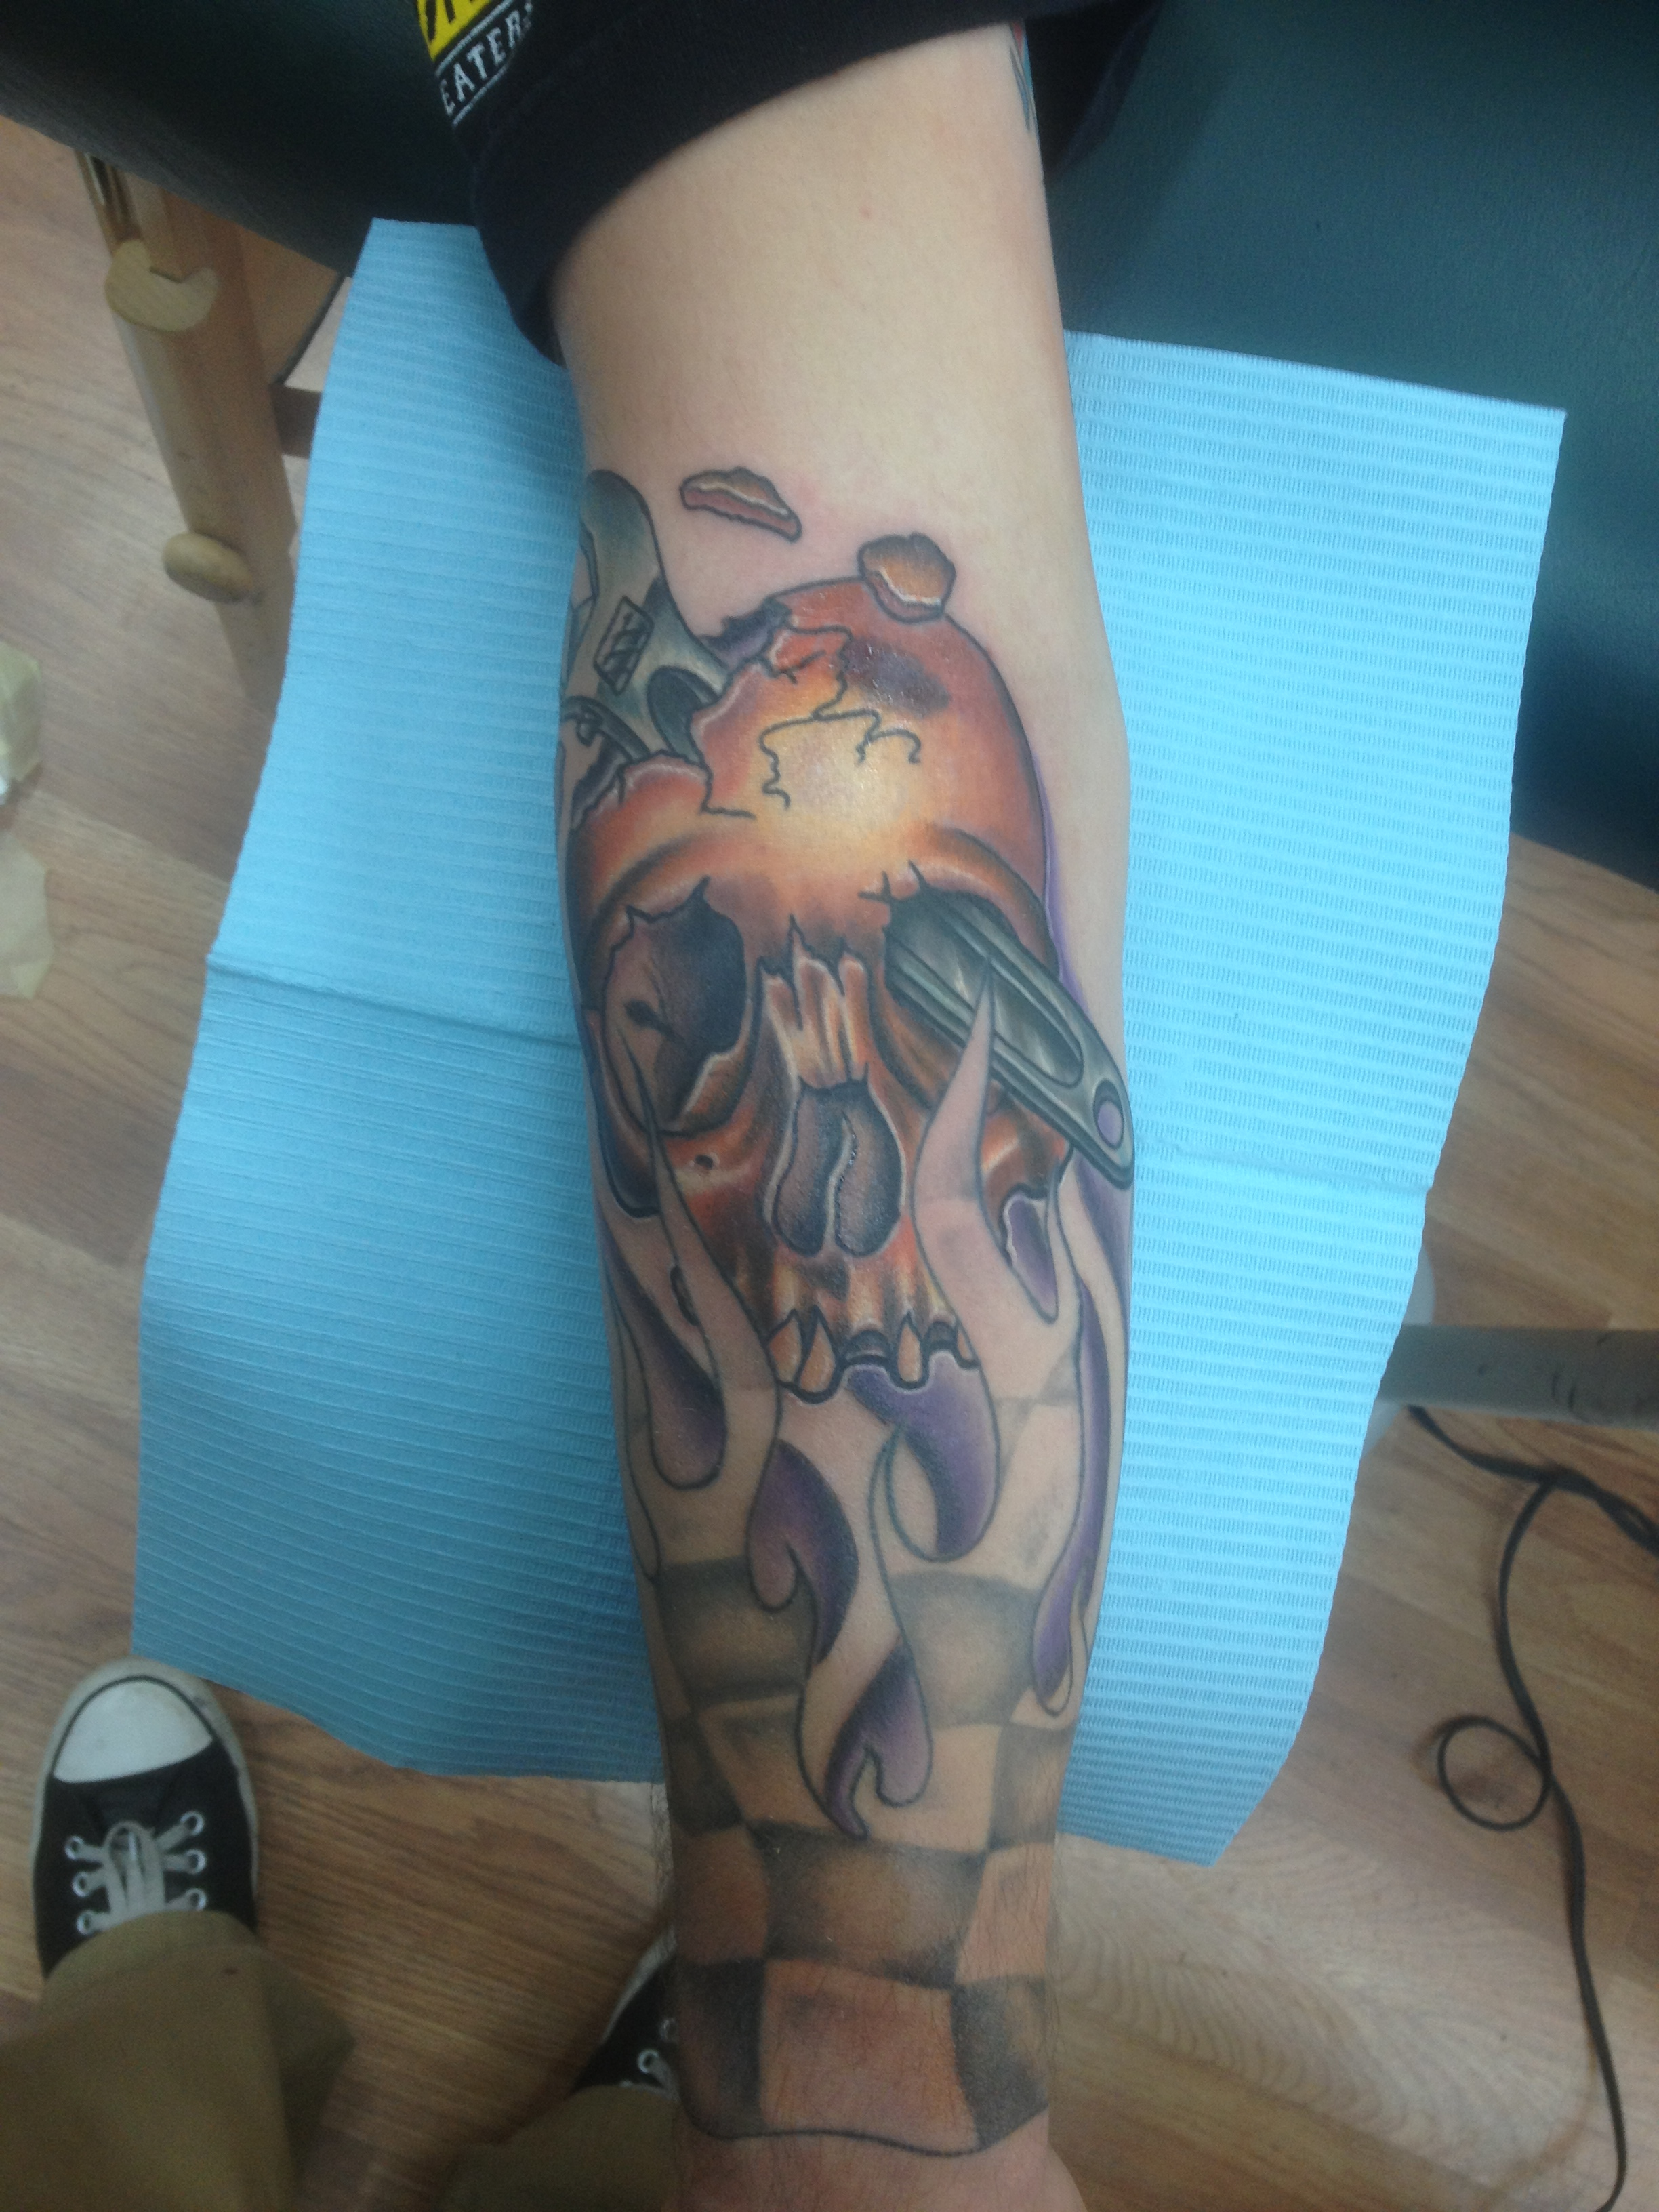 tough_manly_cool_realistic_traditional_illustrative_skull_wrench_gear_head_filler_tattoo_david_meek_tattoos_true_til_death_tattoo_company_ashtabula_ohio